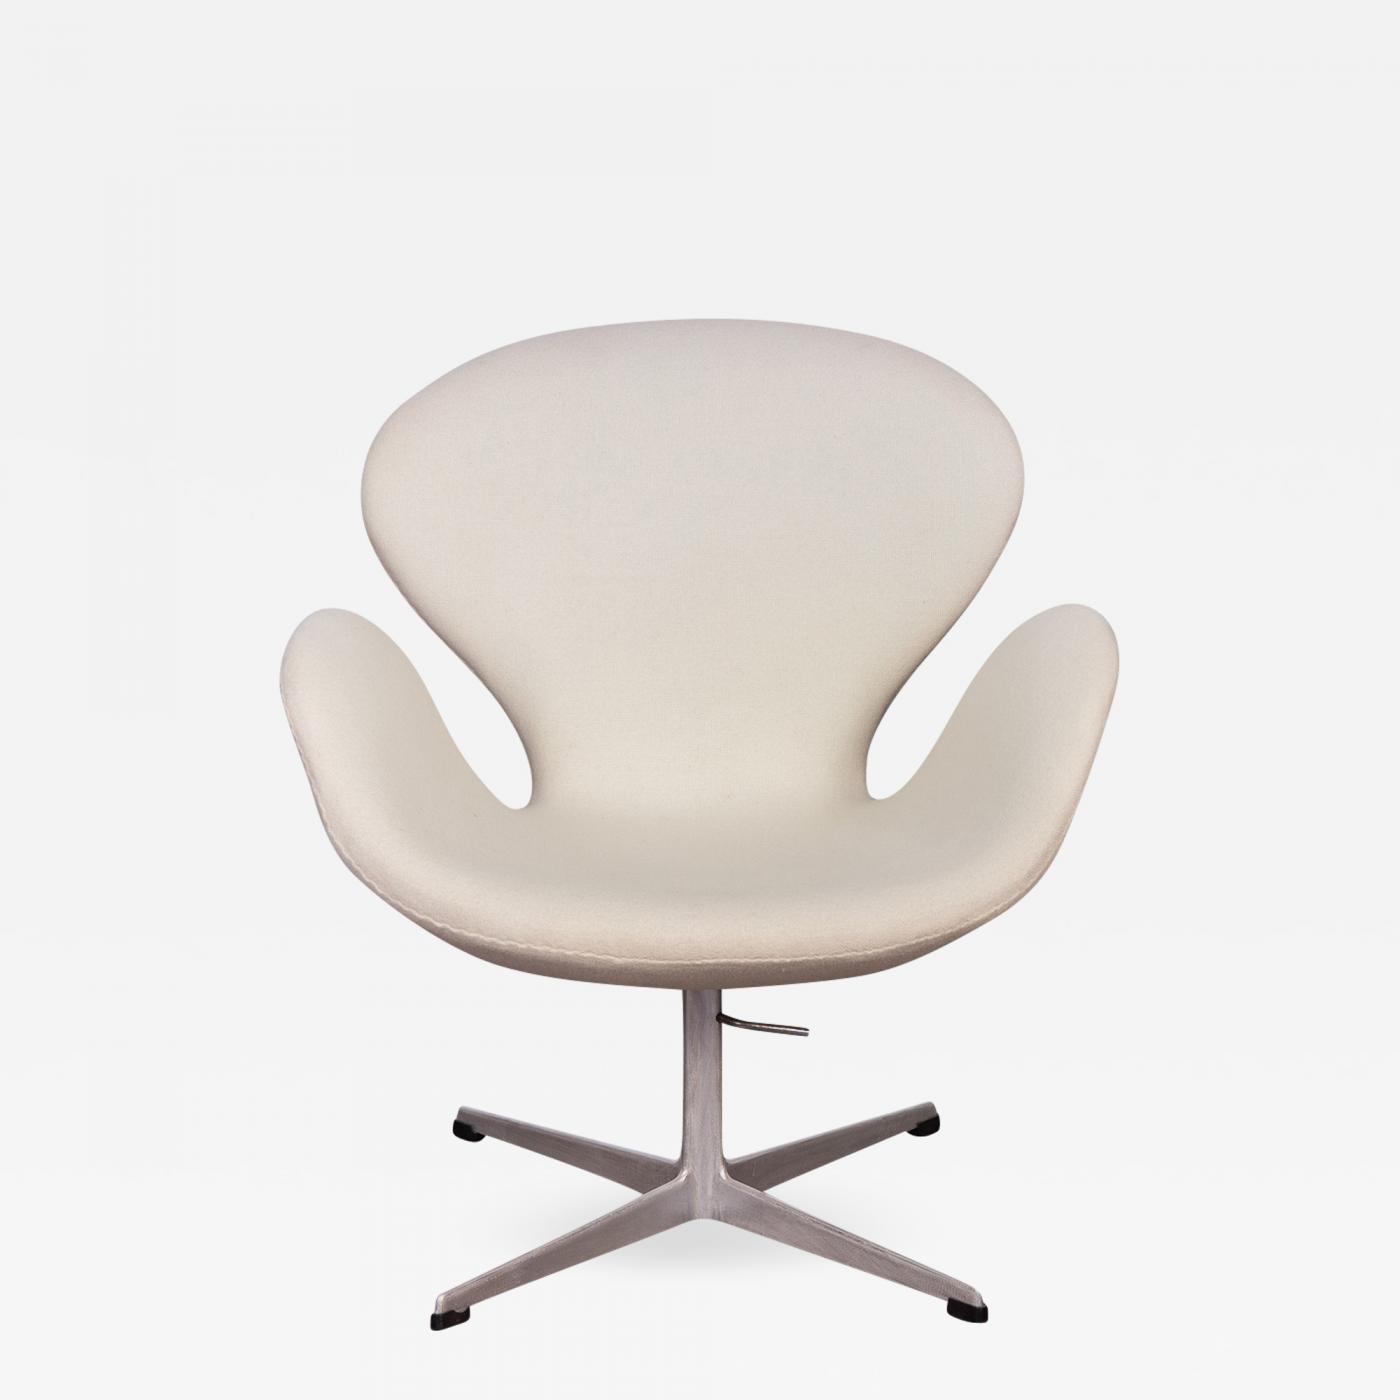 arne jacobsen swan chair by arne jacobsen